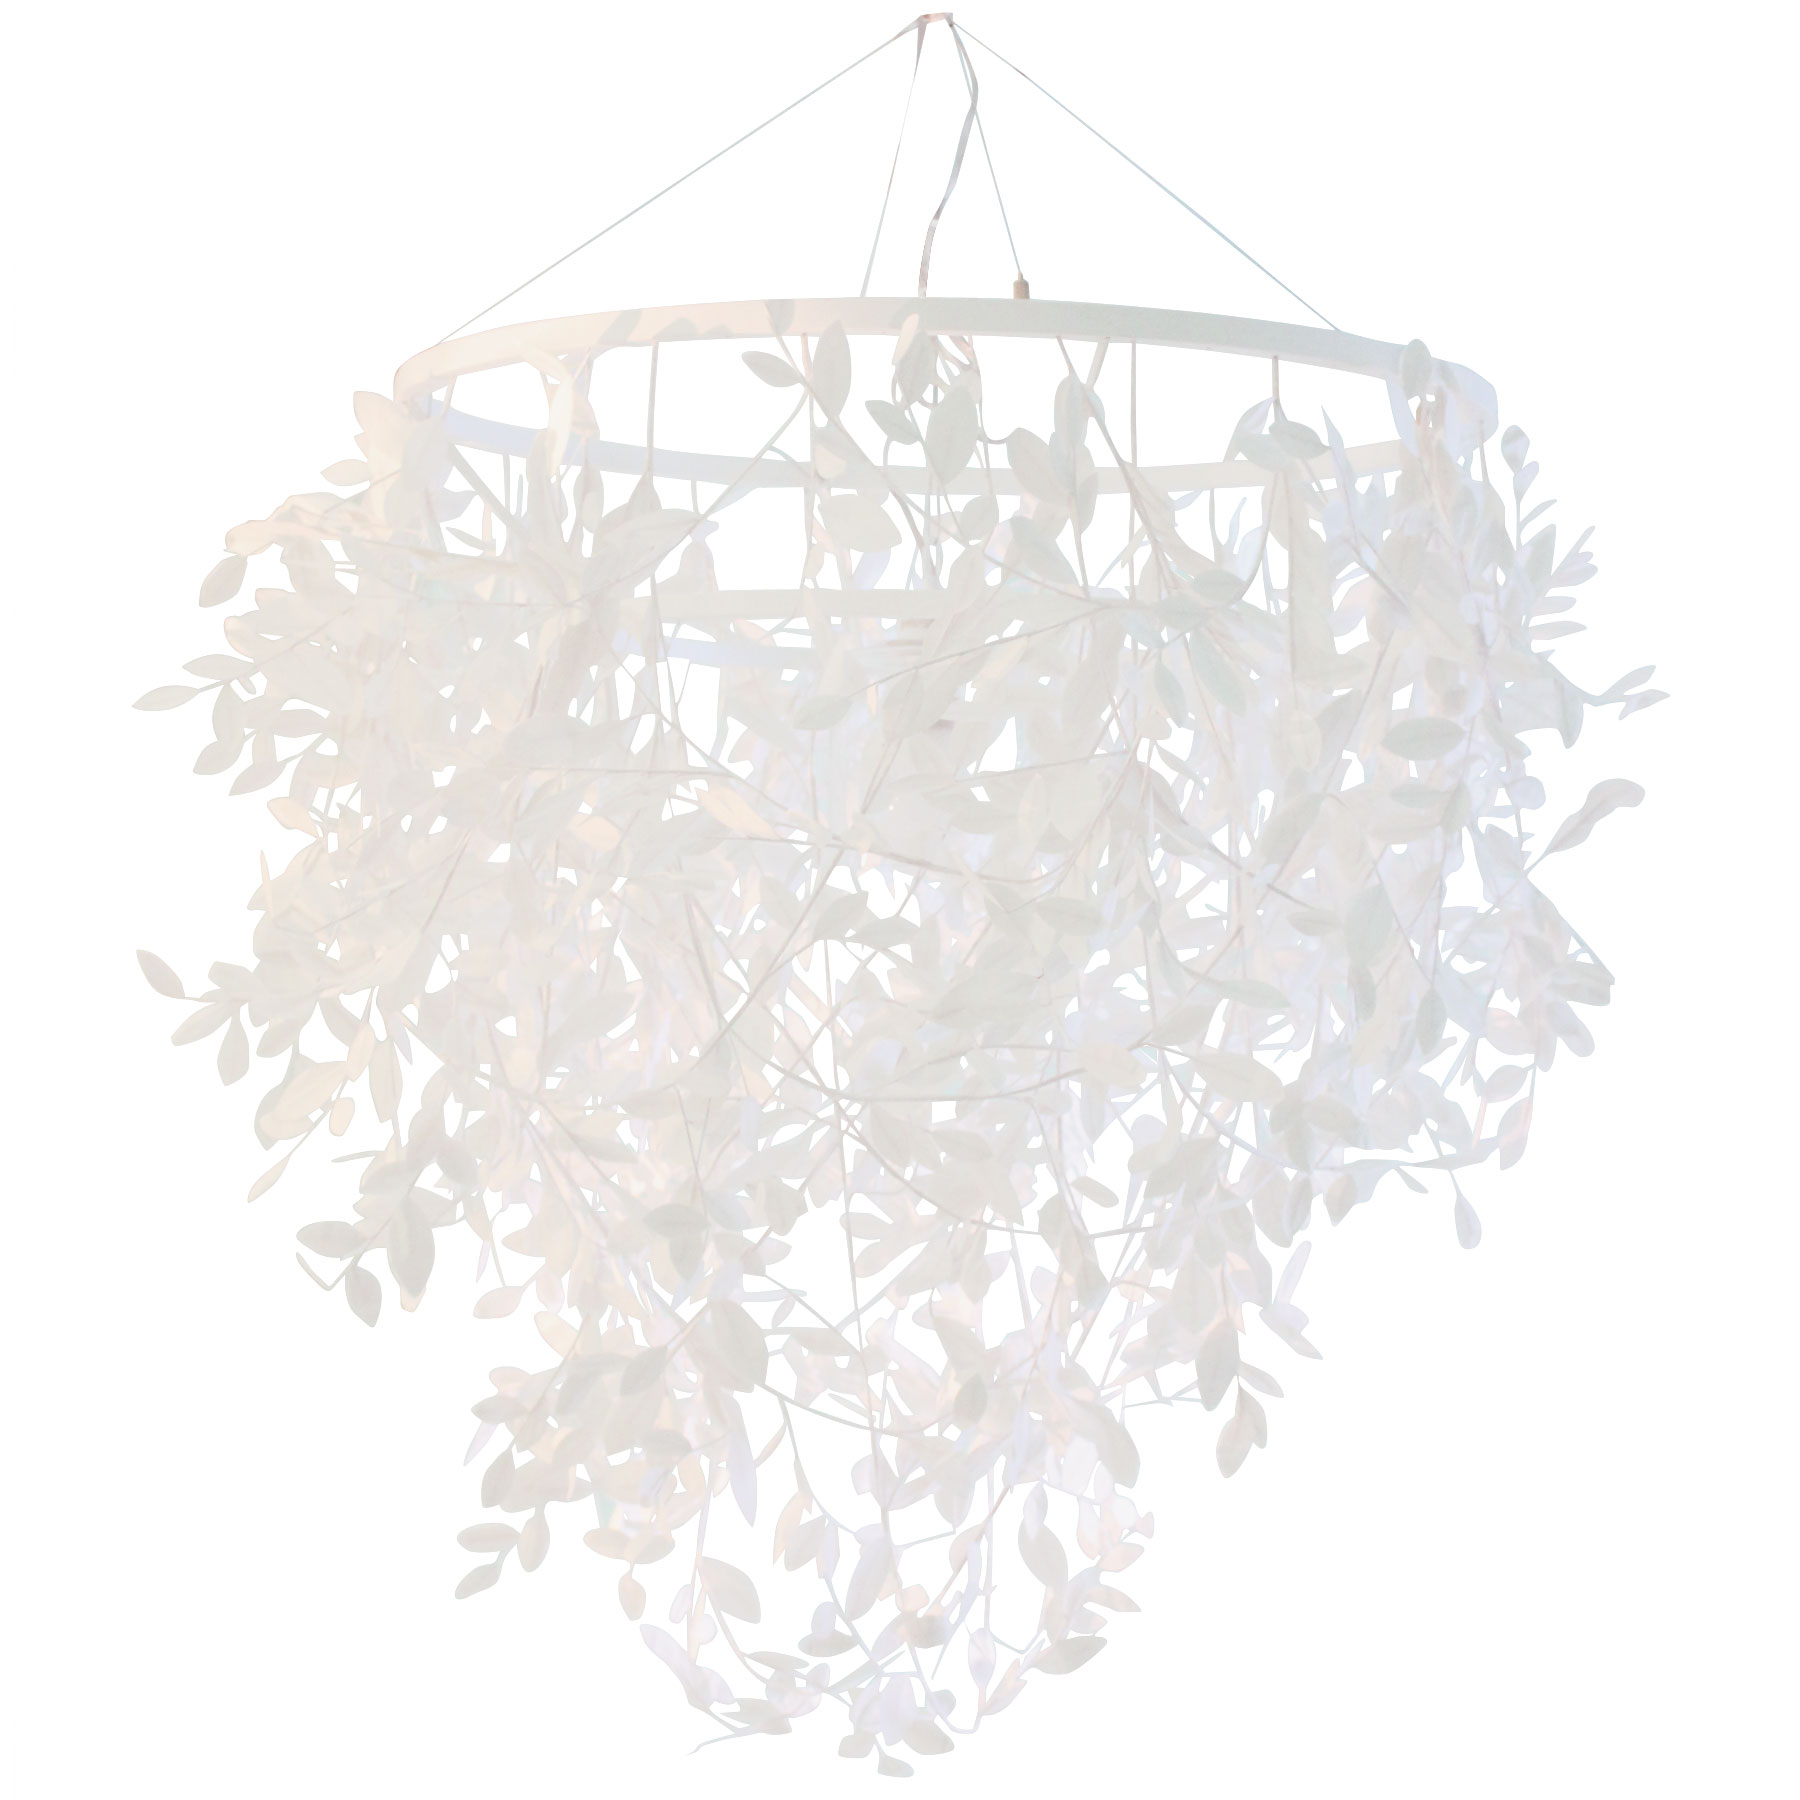 Paper-Foresti grande pendant lamp ペーパーフォレスティ グランデ ペンダントランプ